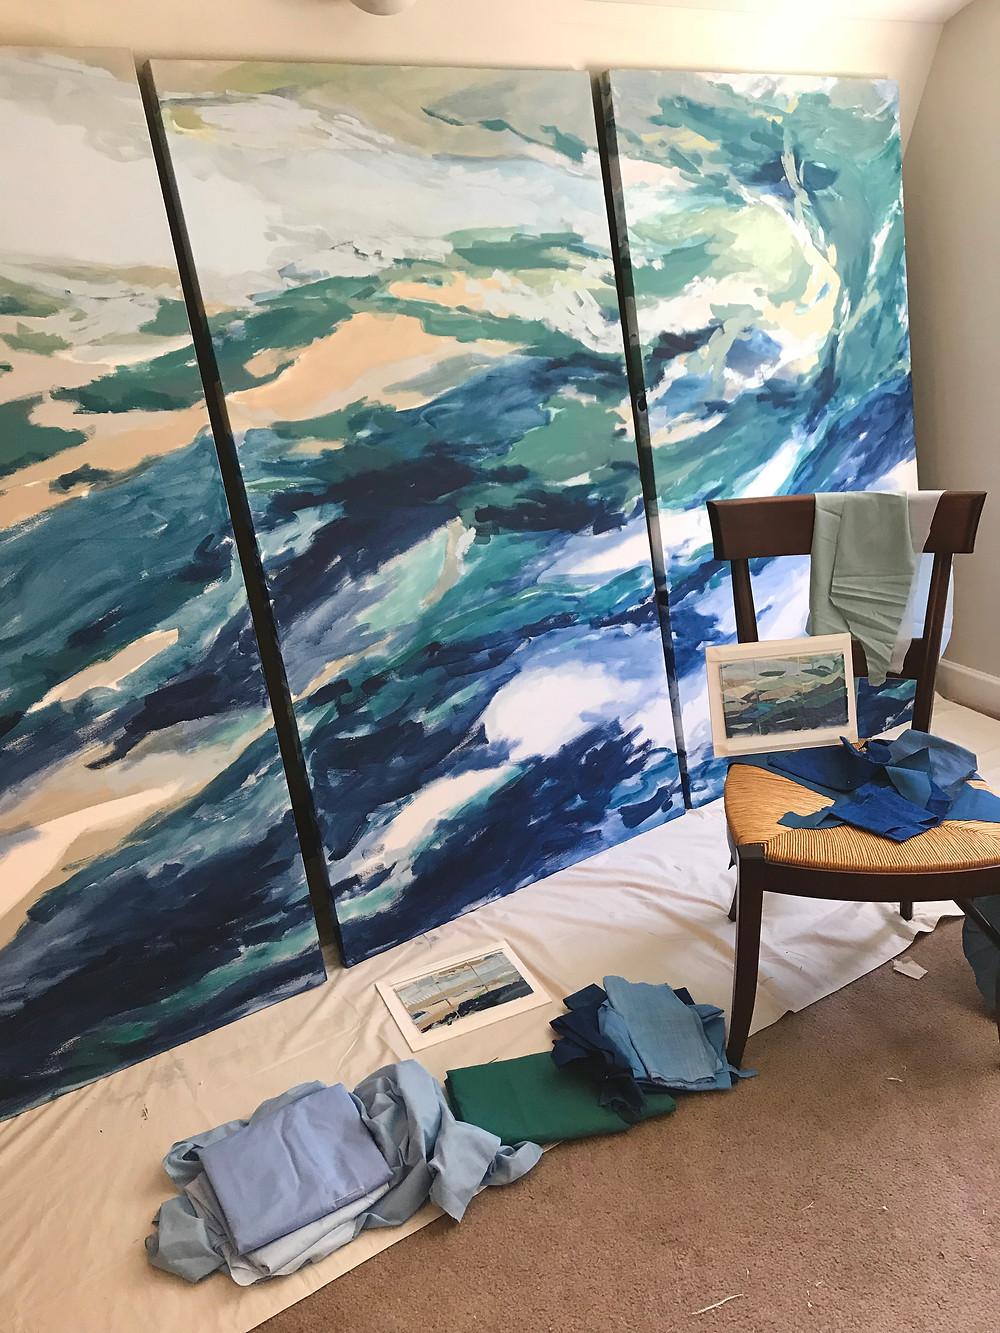 Karin Olah, Sea Wall, 2018, Textiles and Mixed Media on Canvas